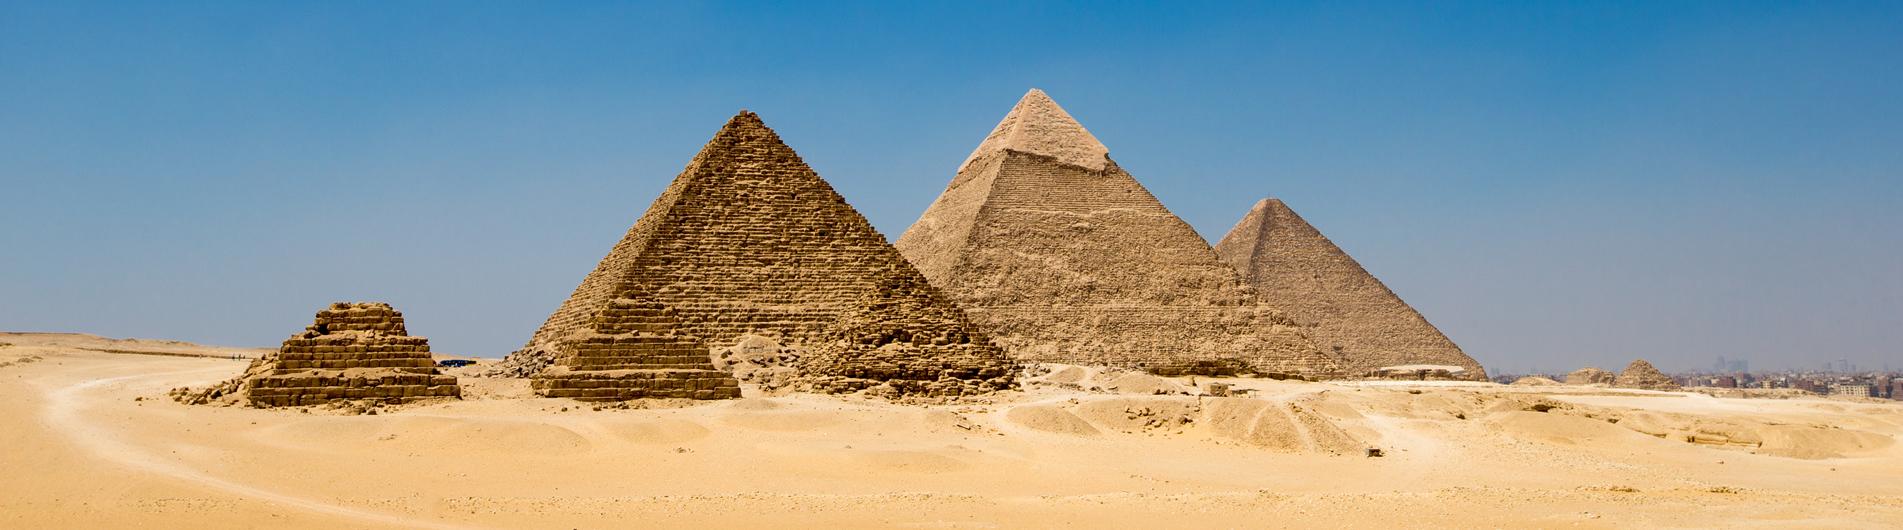 City Break Holidays in Egypt